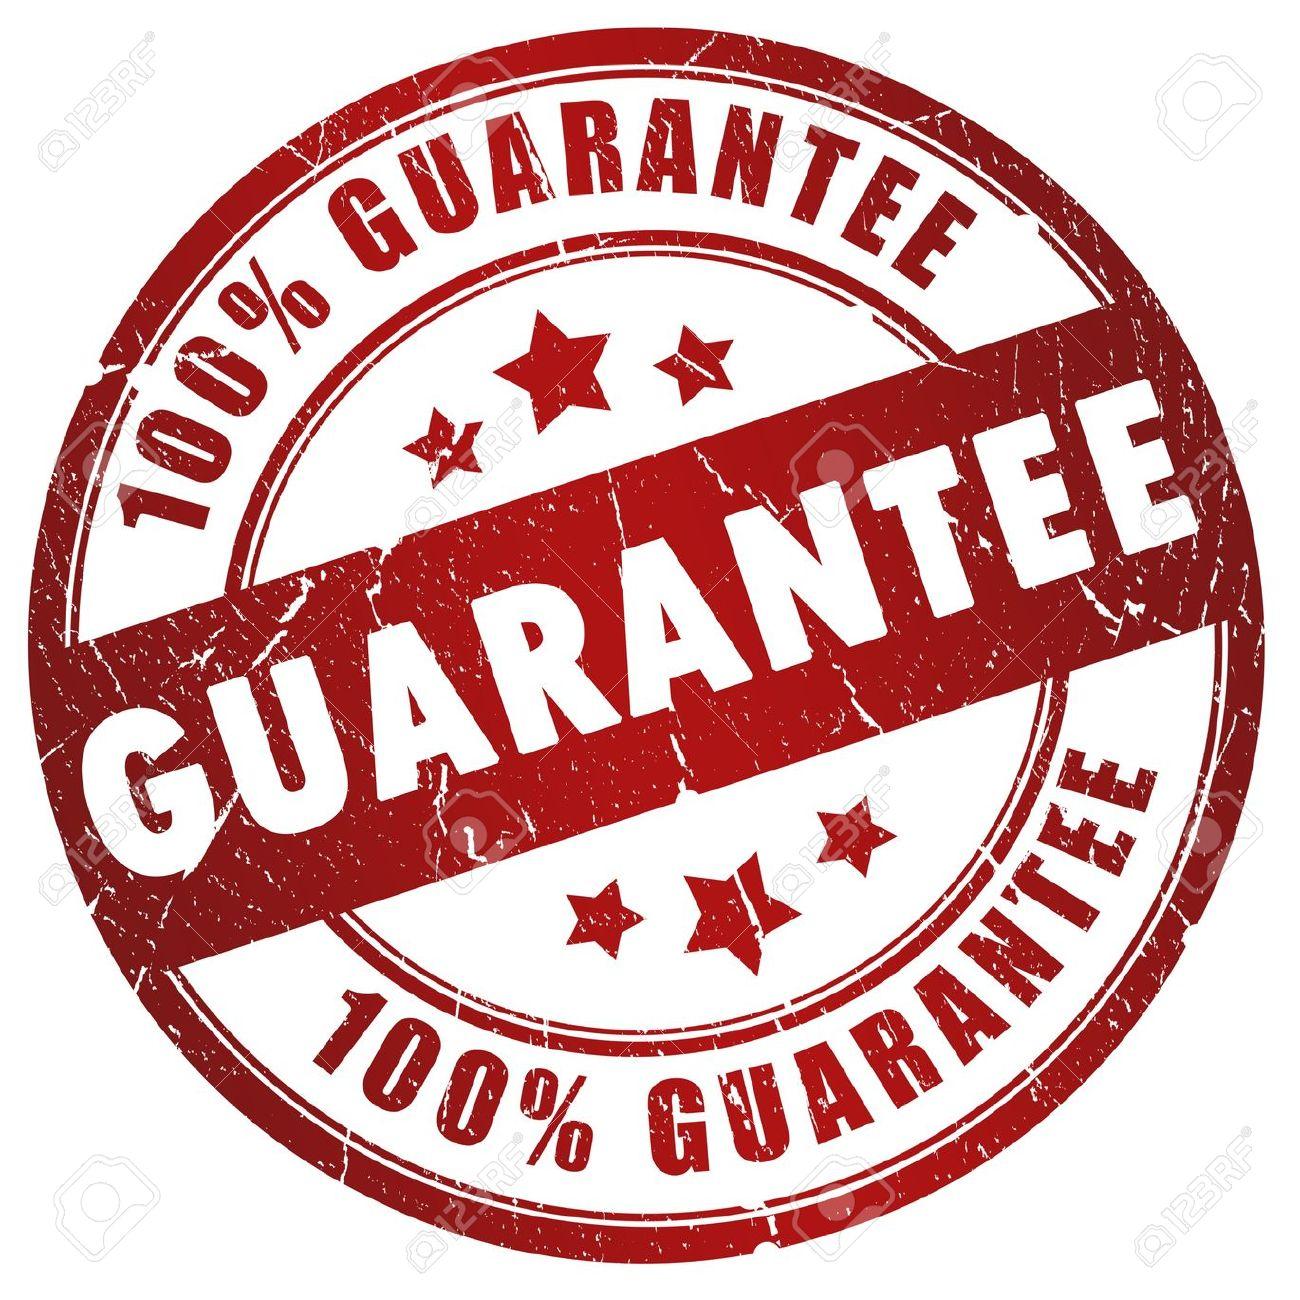 Guarantee PNG - 6439